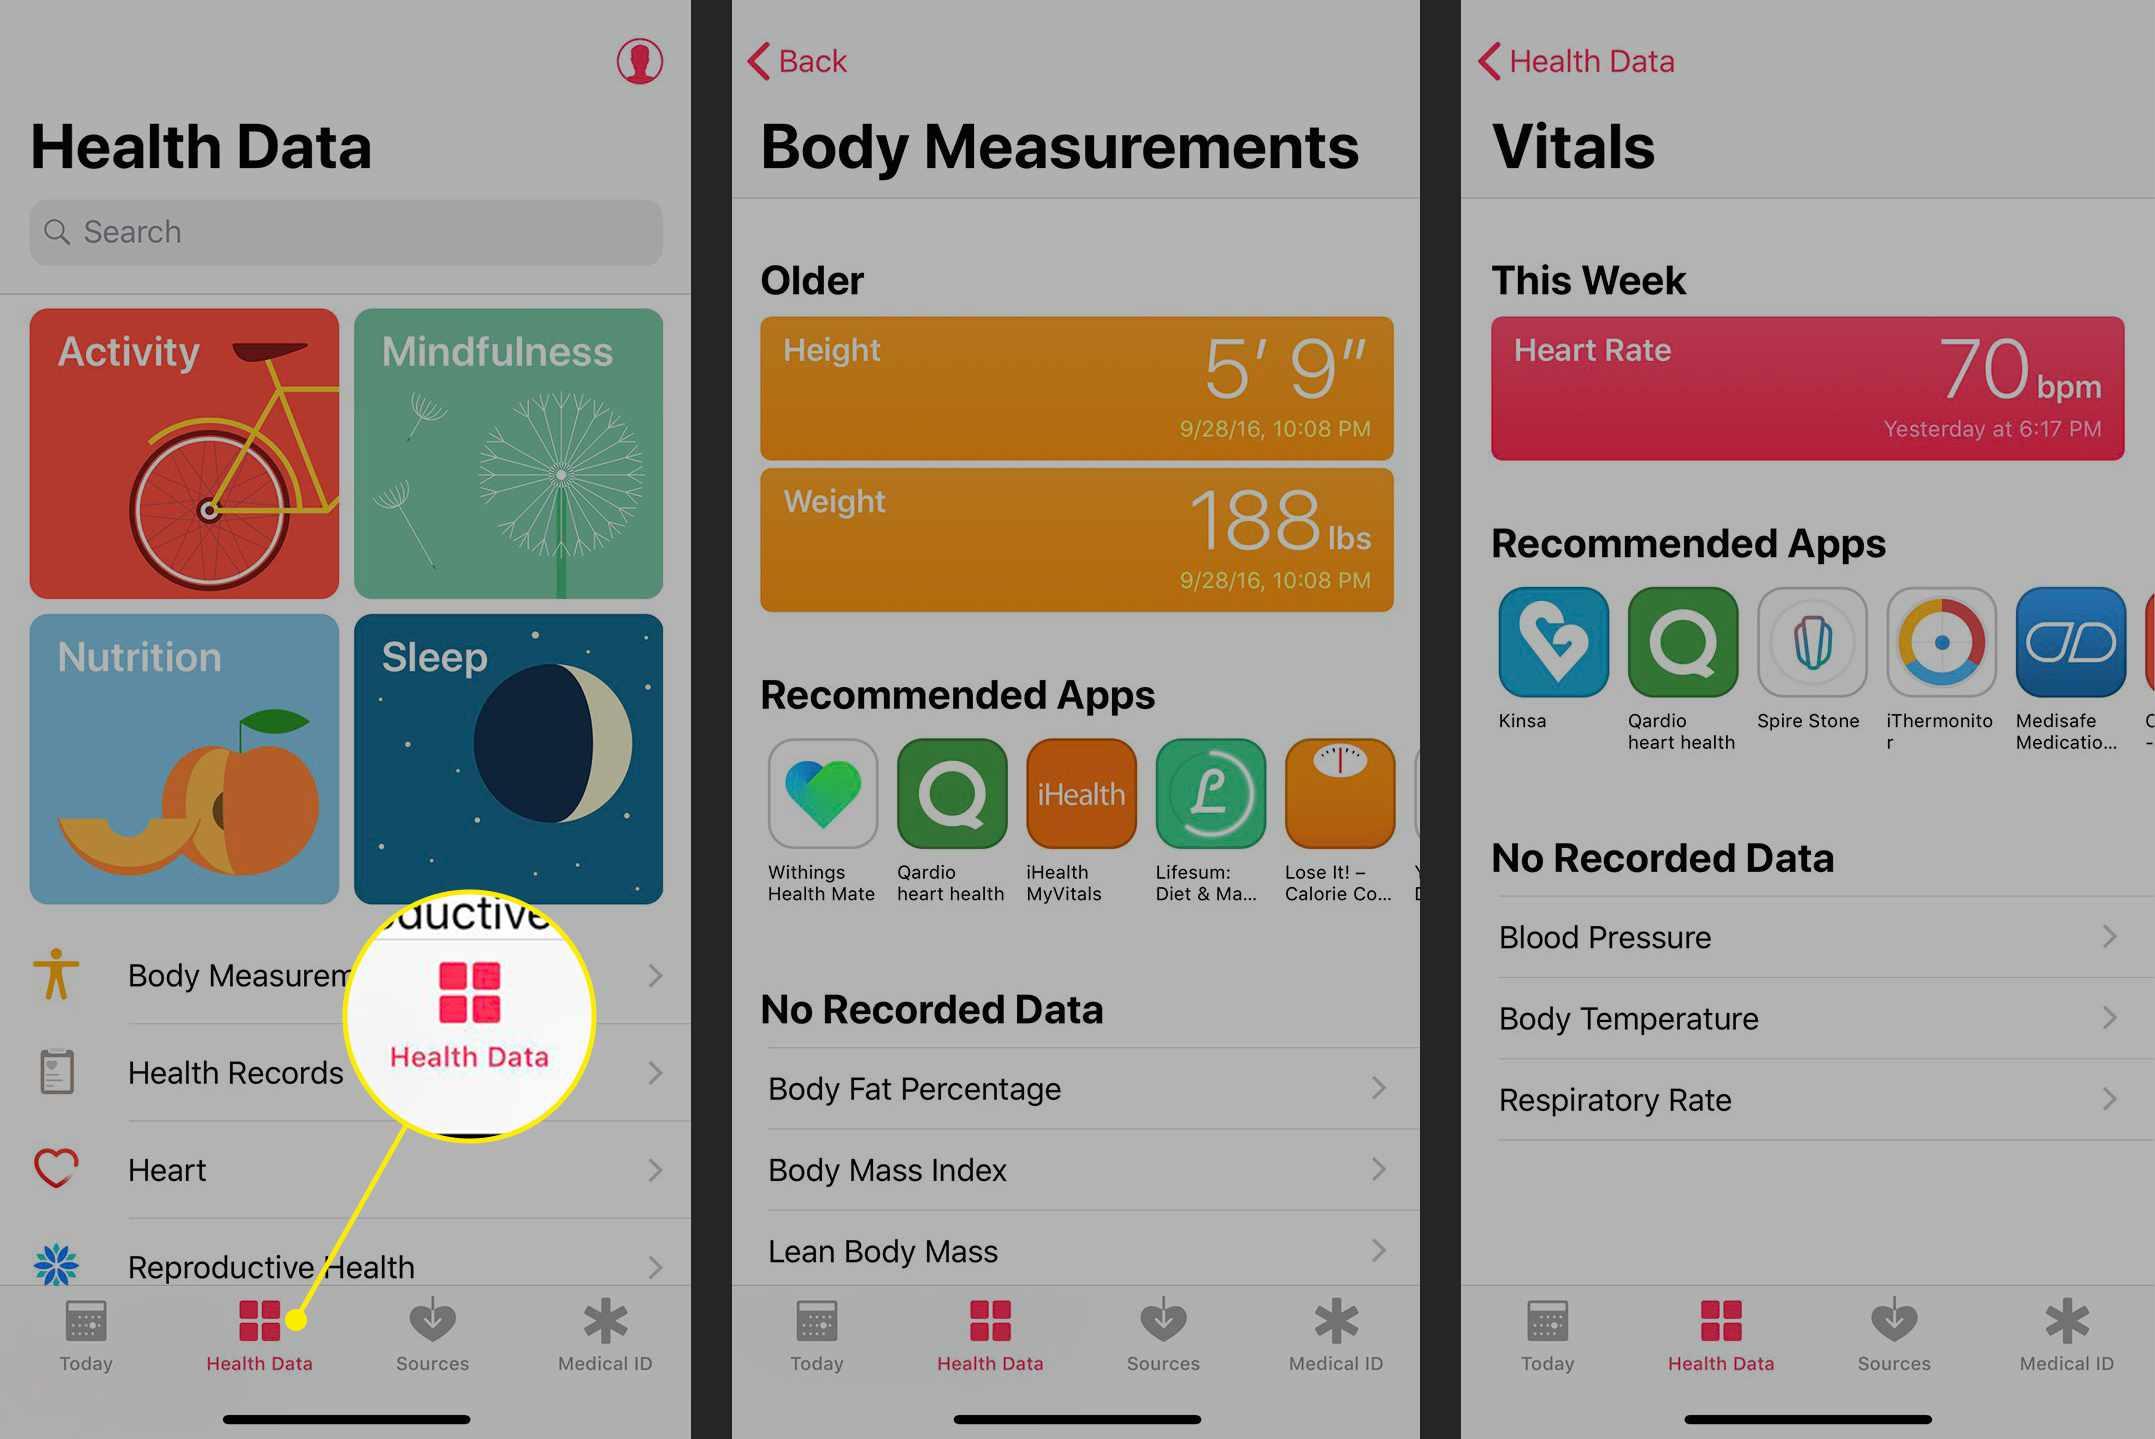 The Health Data tab in the Health app